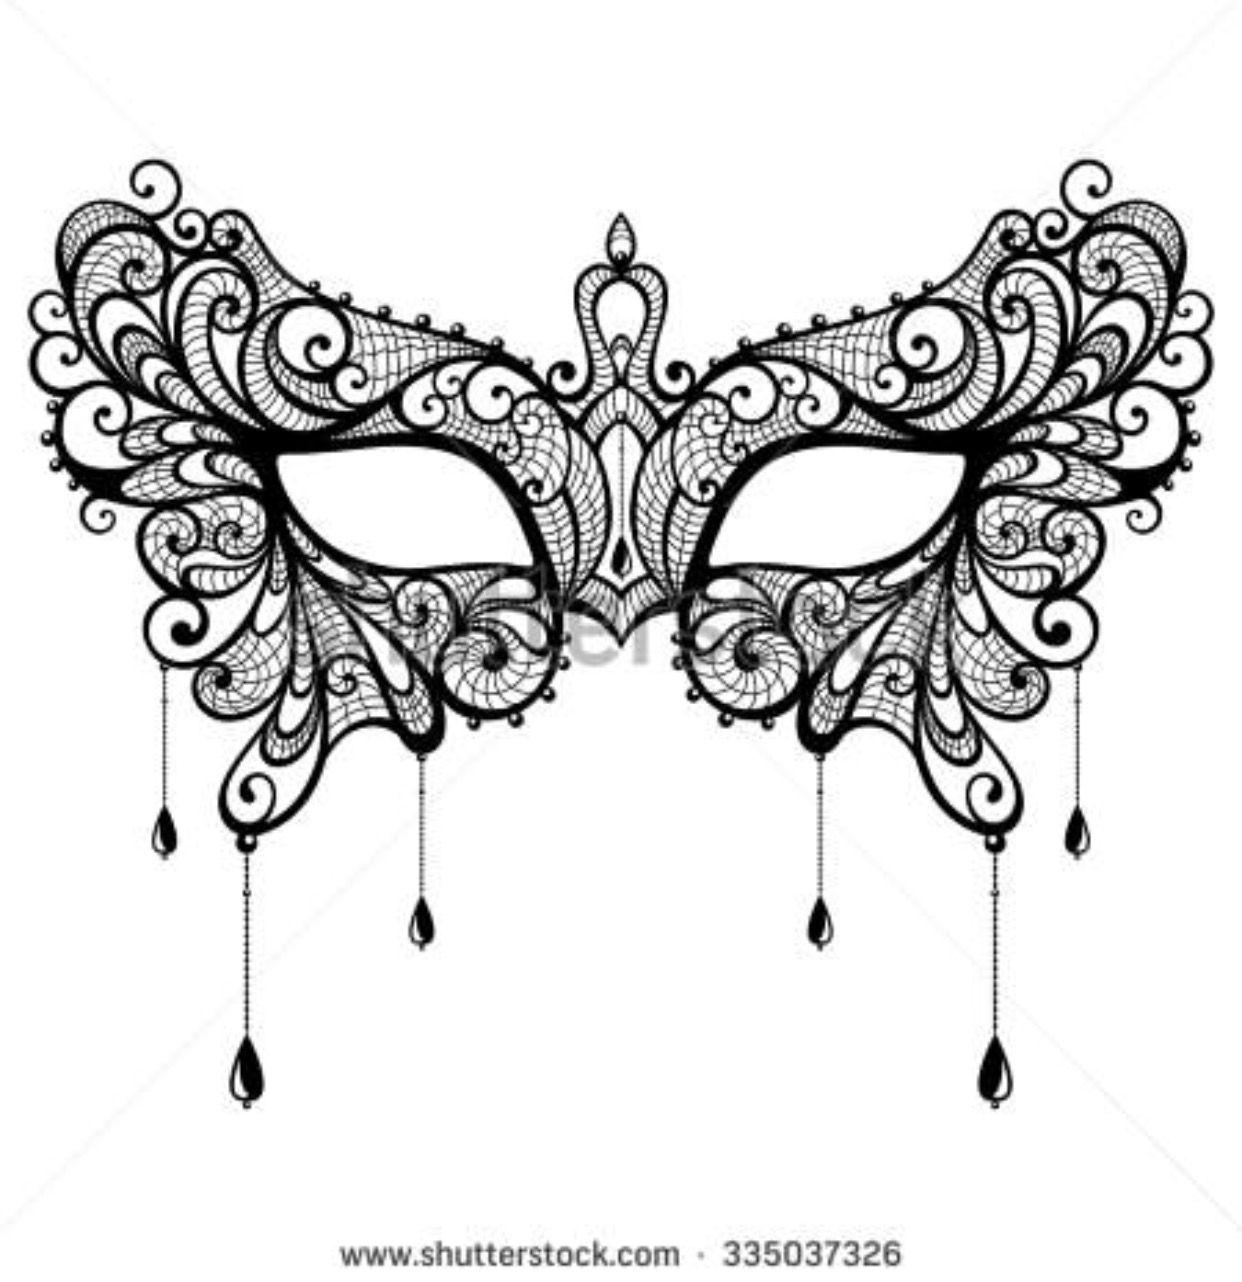 pin by carmen castro on inis 15 idea black and white masquerade